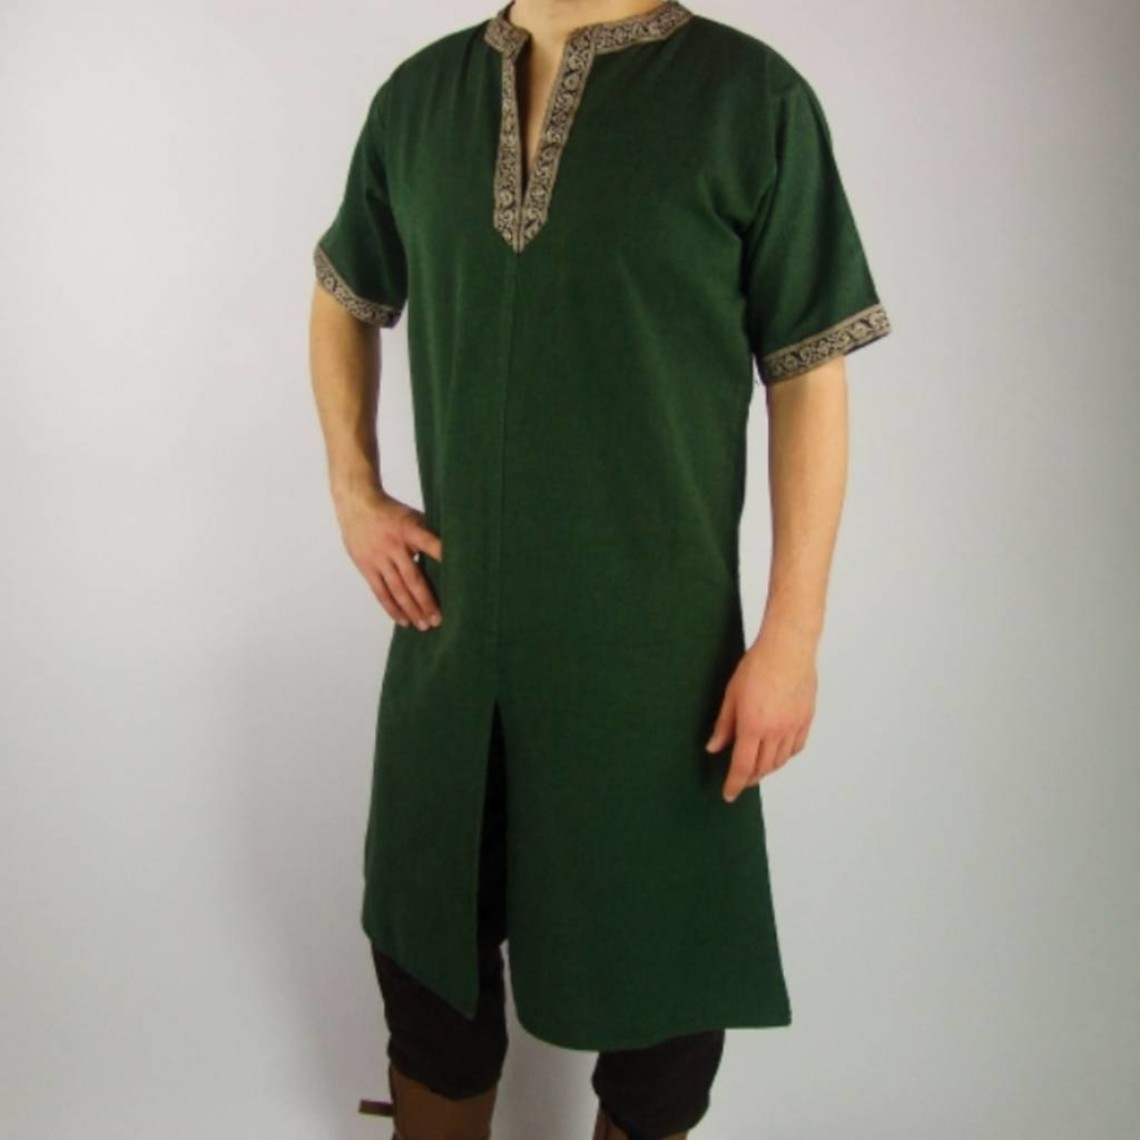 Leonardo Carbone Túnica celta, mangas cortas, crema